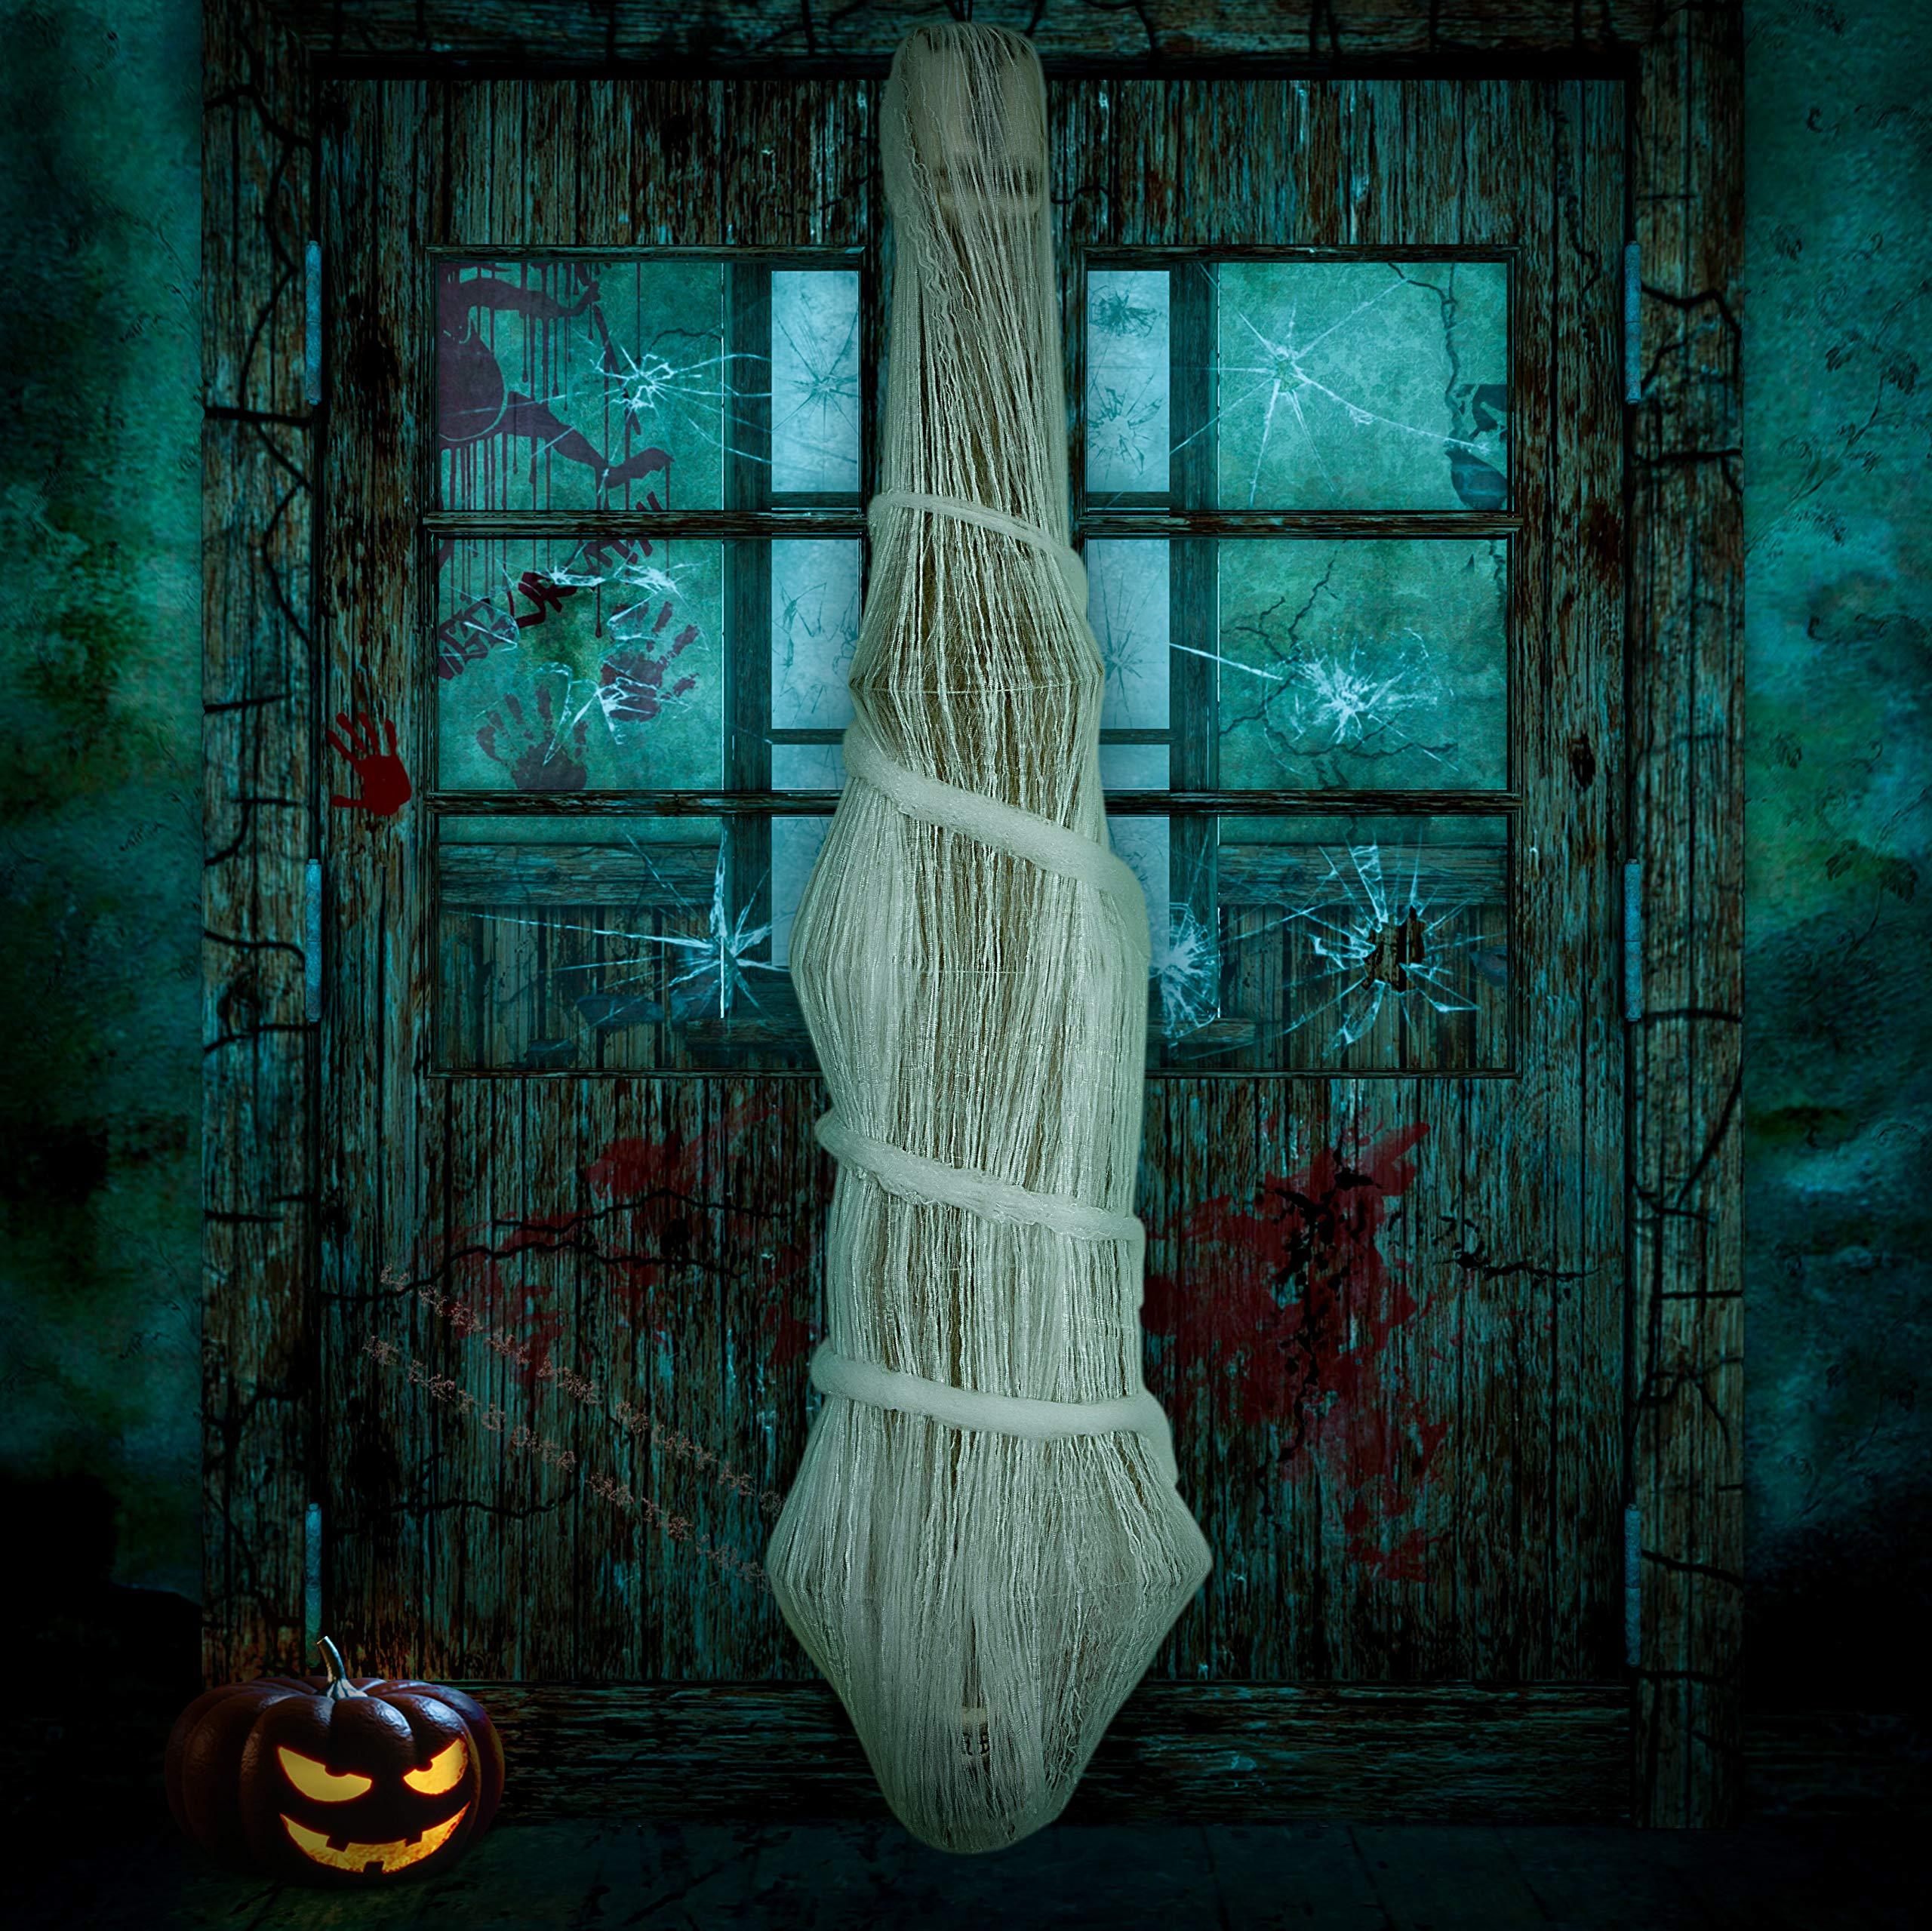 Amazon Com Jollylife Cocoon Corpse Halloween Decorations Hallomas Party Indoor Outdoor Creepy Hanging Haunted House Props Spooky Tree Decor 68 Inches Garden Outdoor